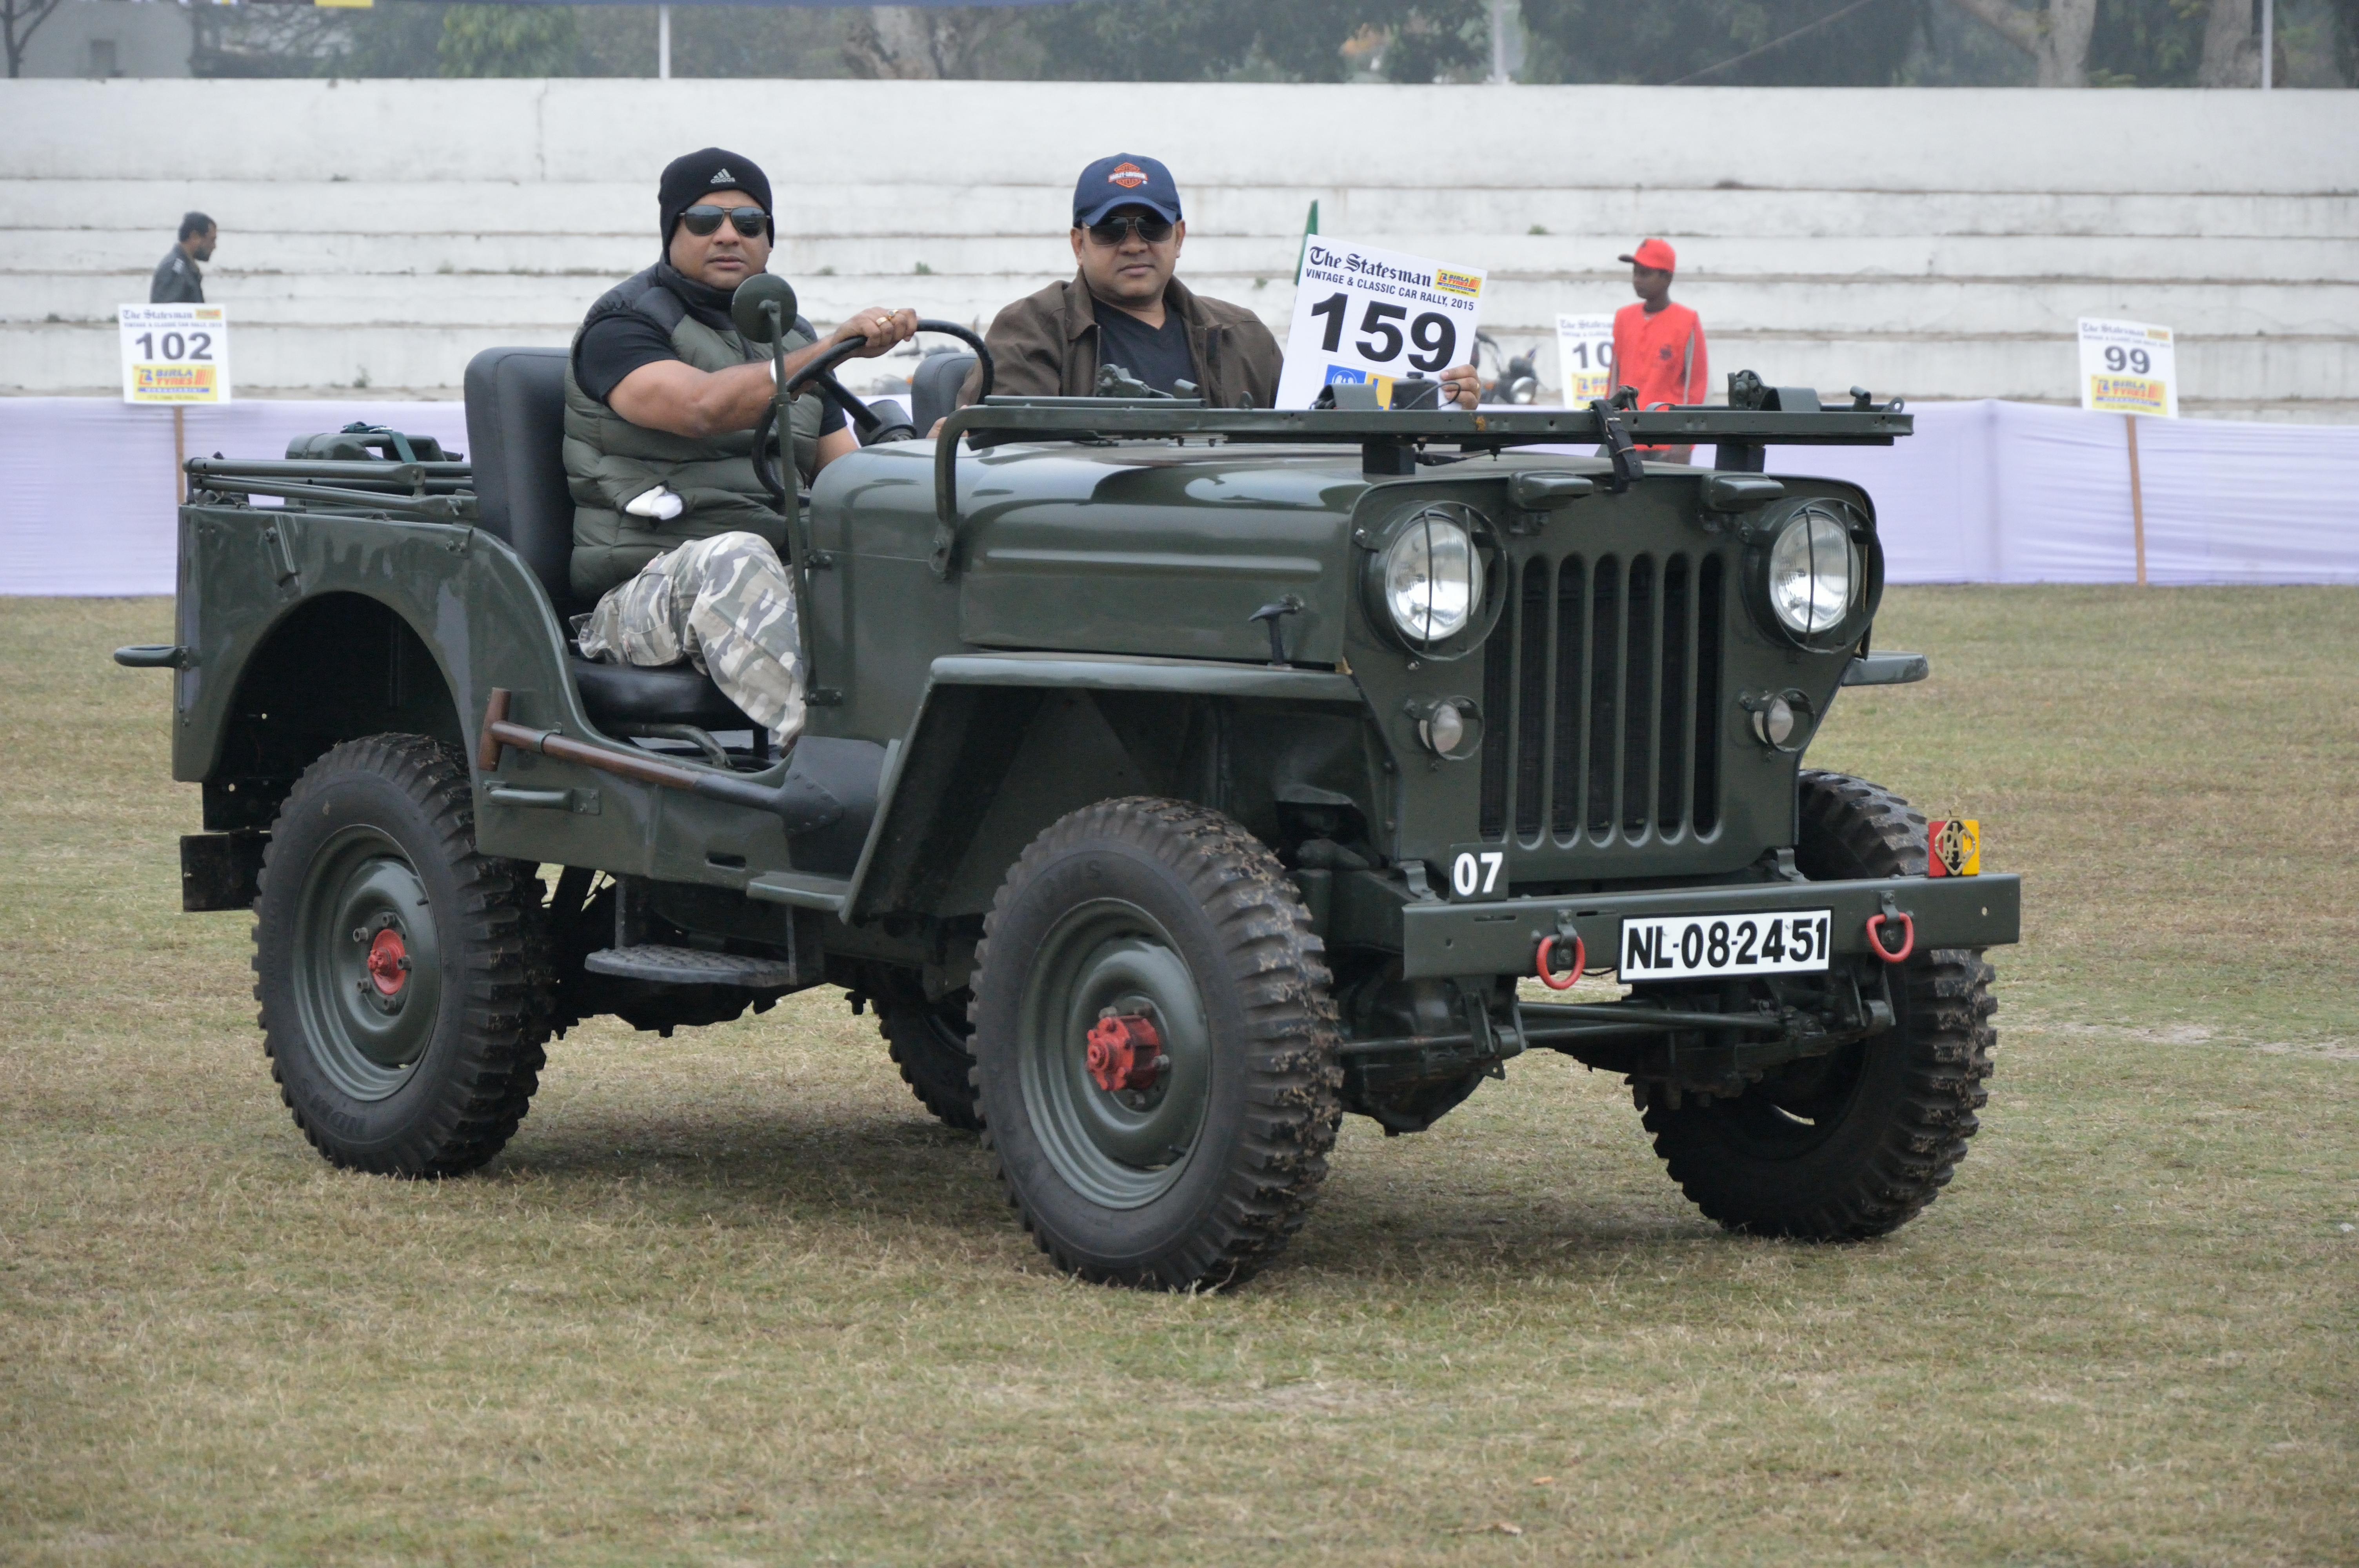 File:Jeep - 1975 - 1300 cc - 4 cyl - NL 08 2451 -